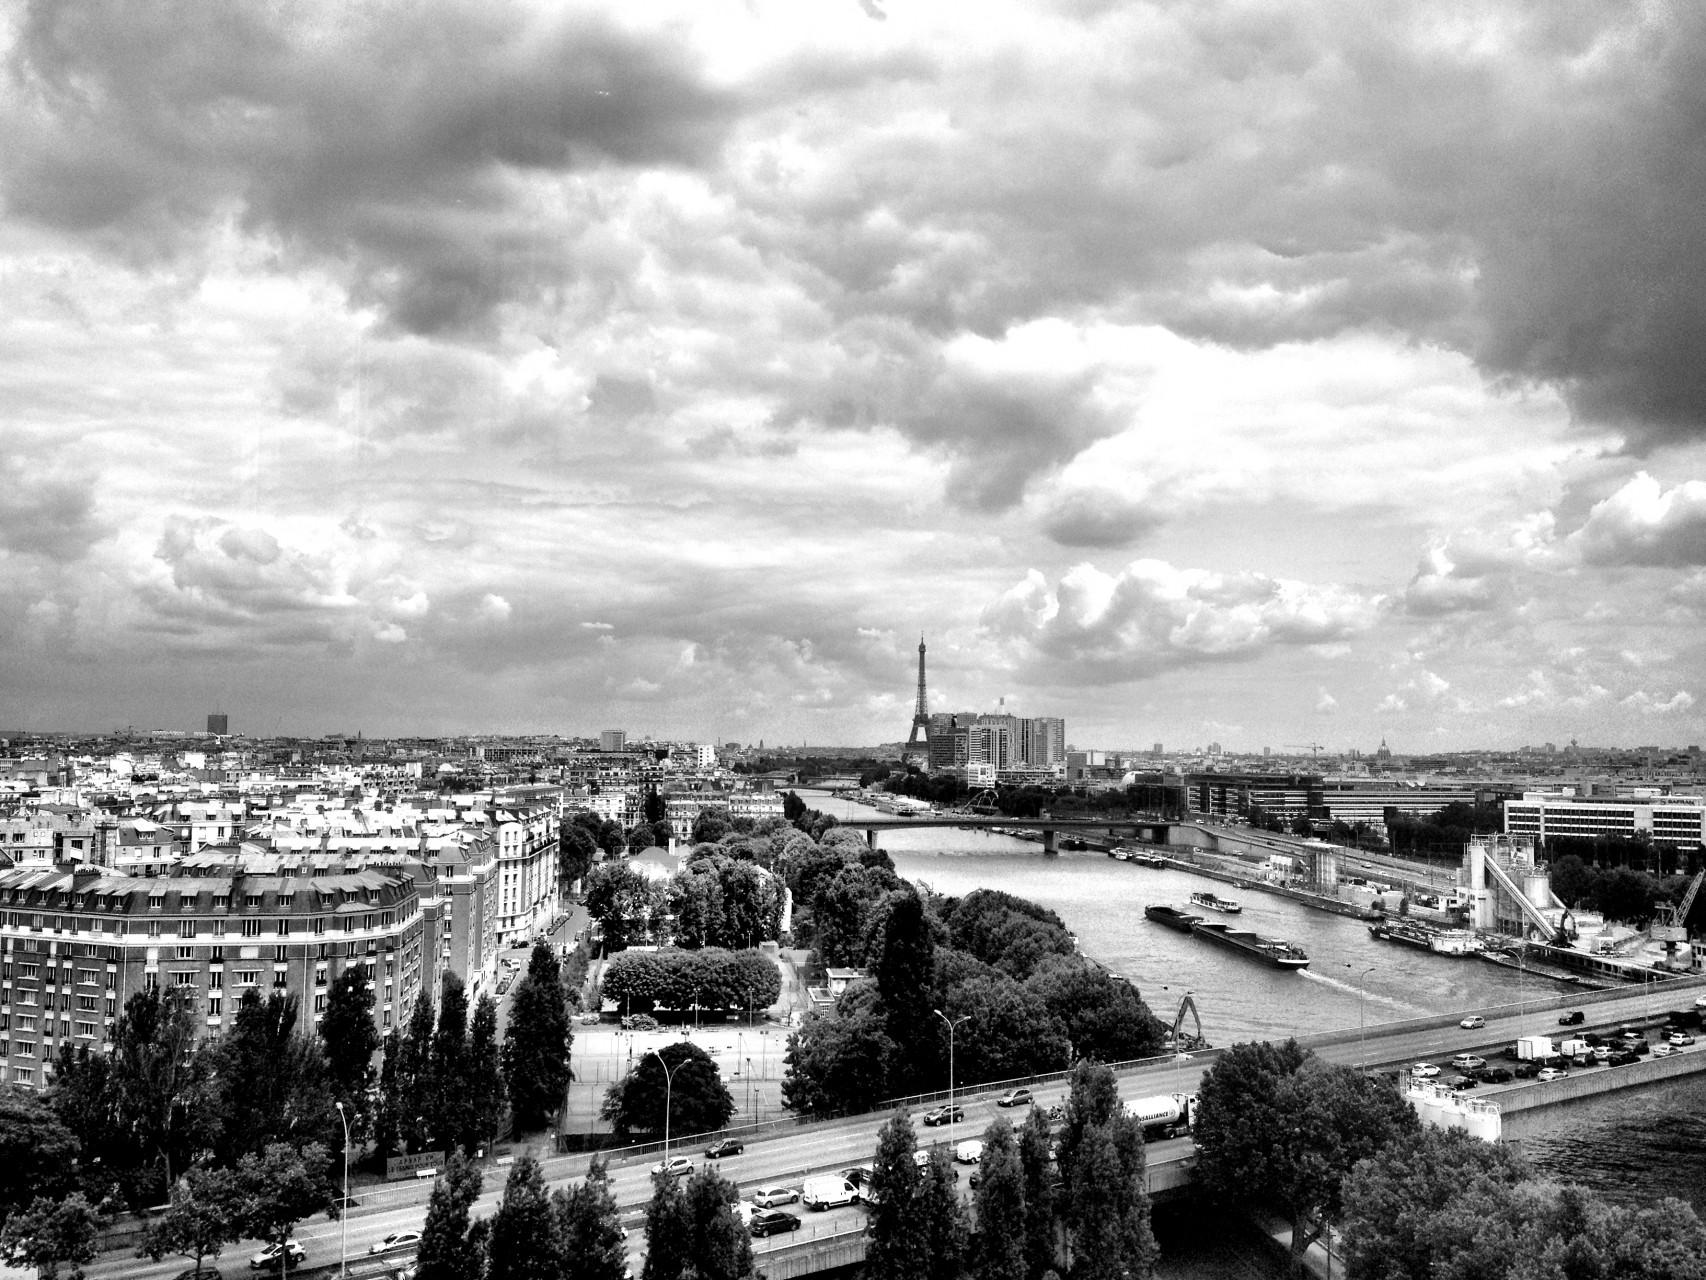 Boulogne-Billancourt - 2014